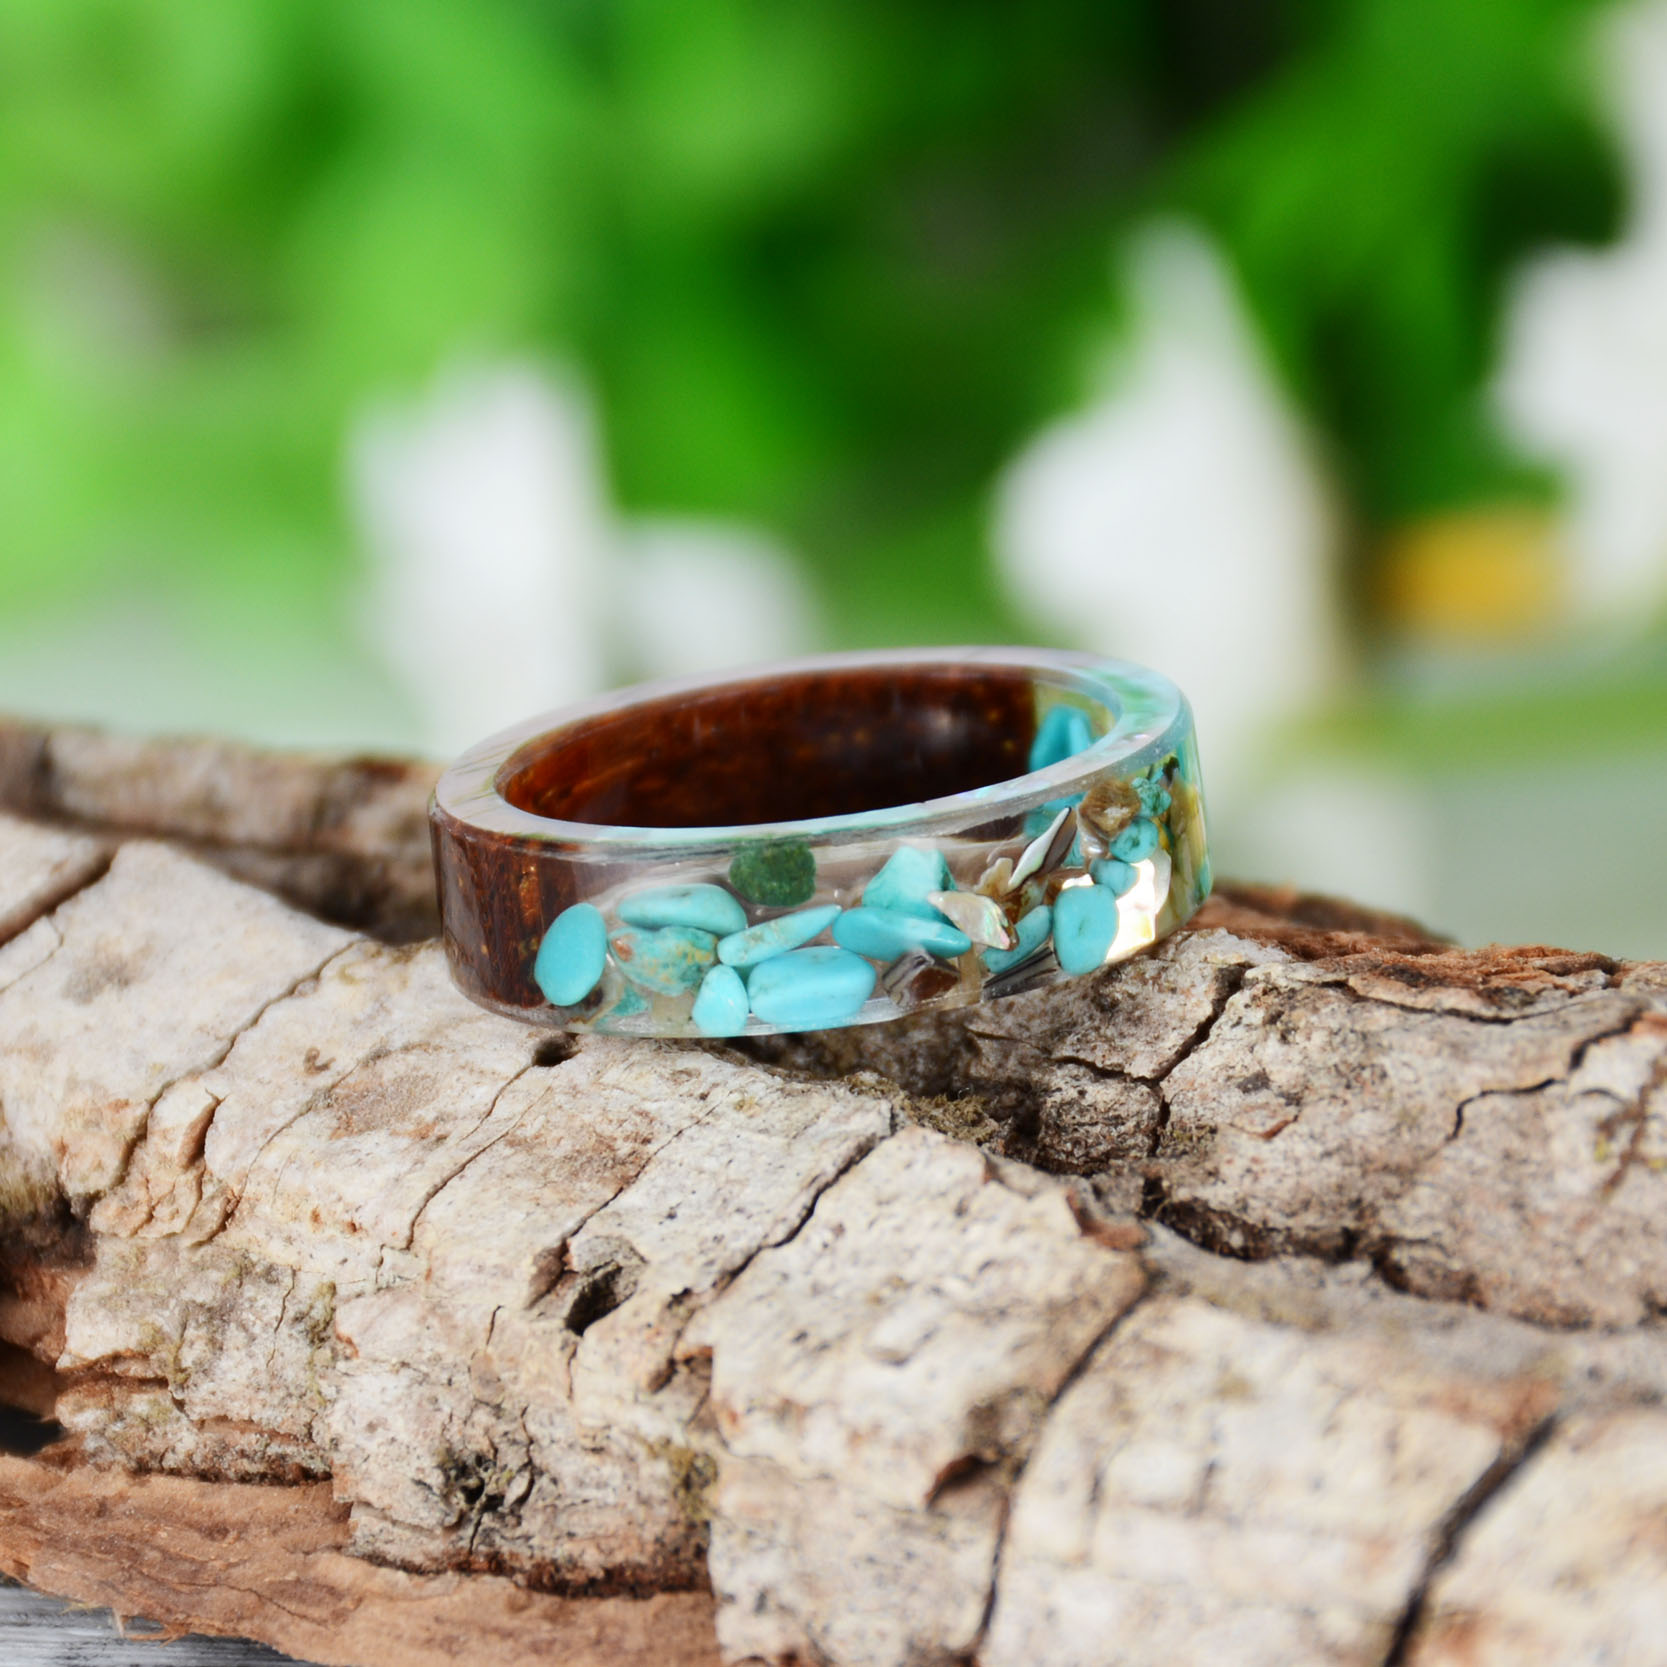 Handmade Wood Resin Ring Many Styles 35